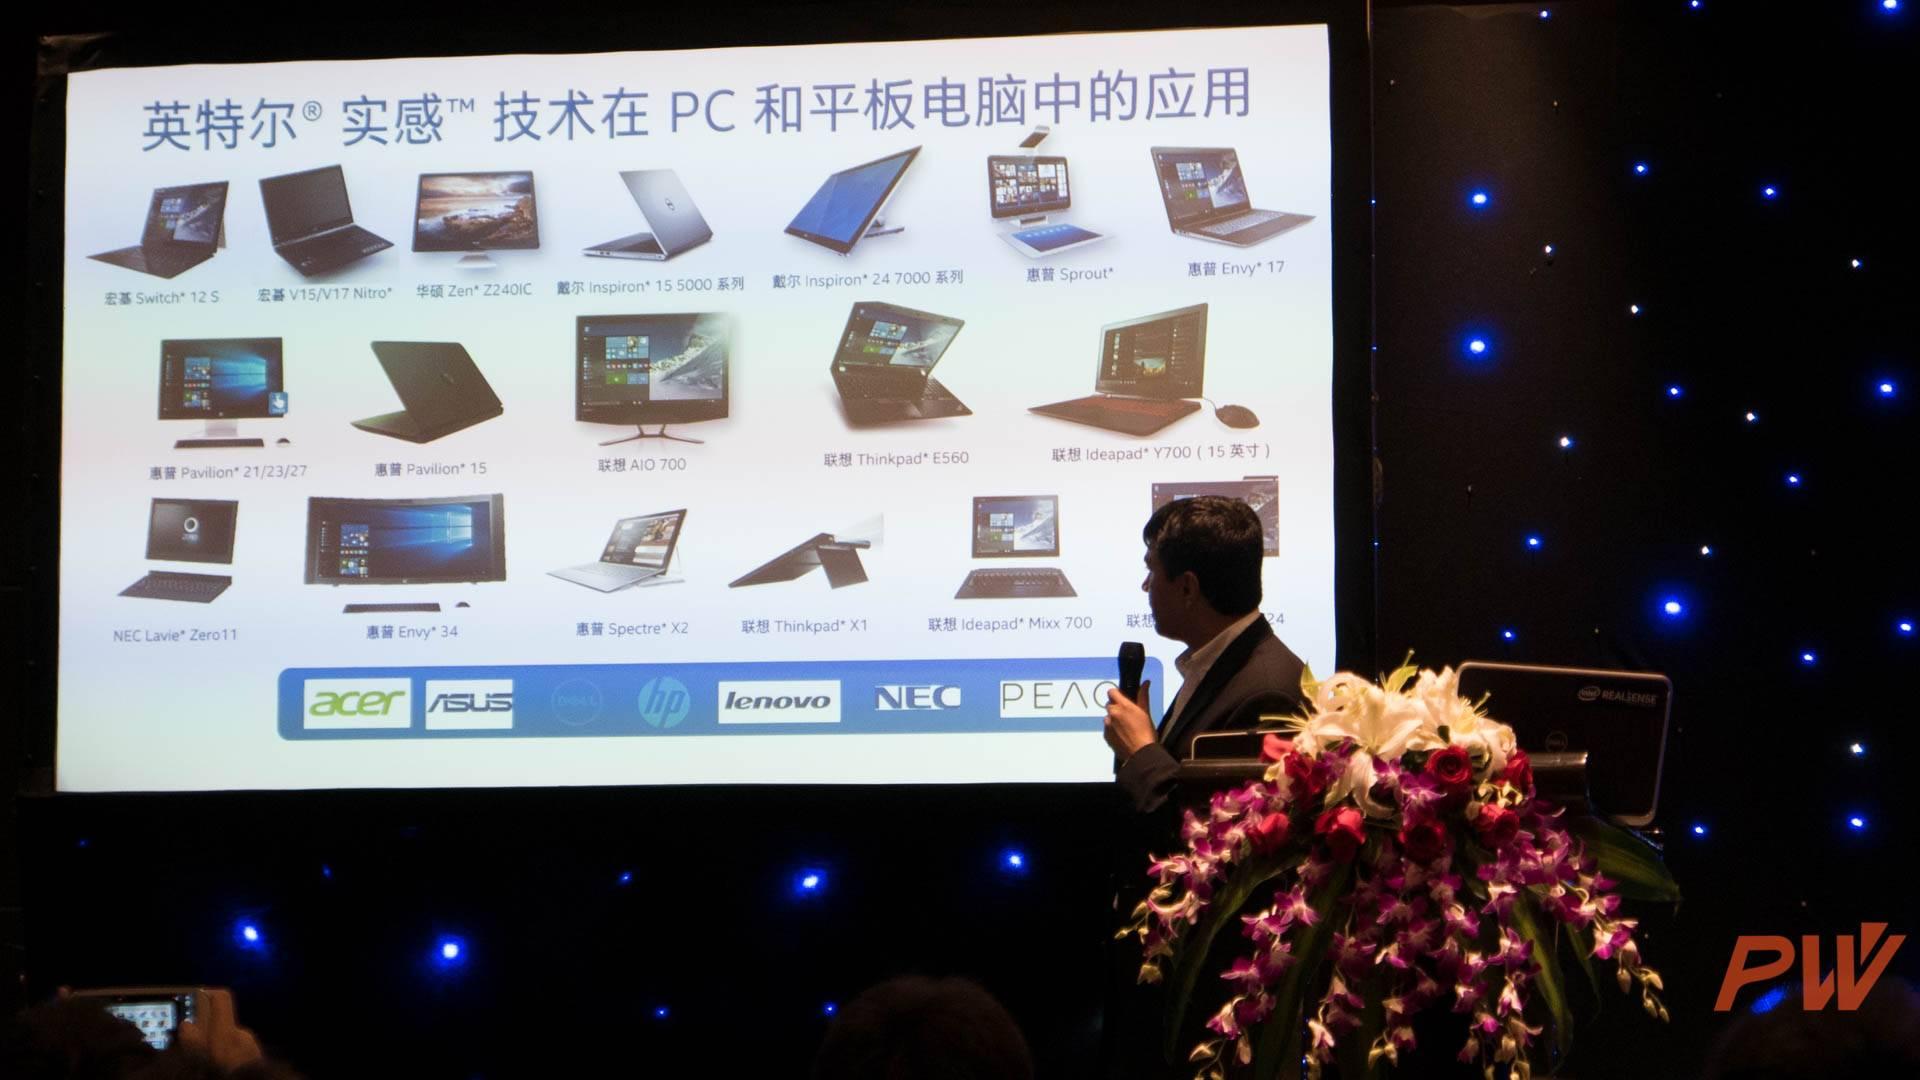 Intel IDF PingWest Shenzhen Photo By Hao Ying-10